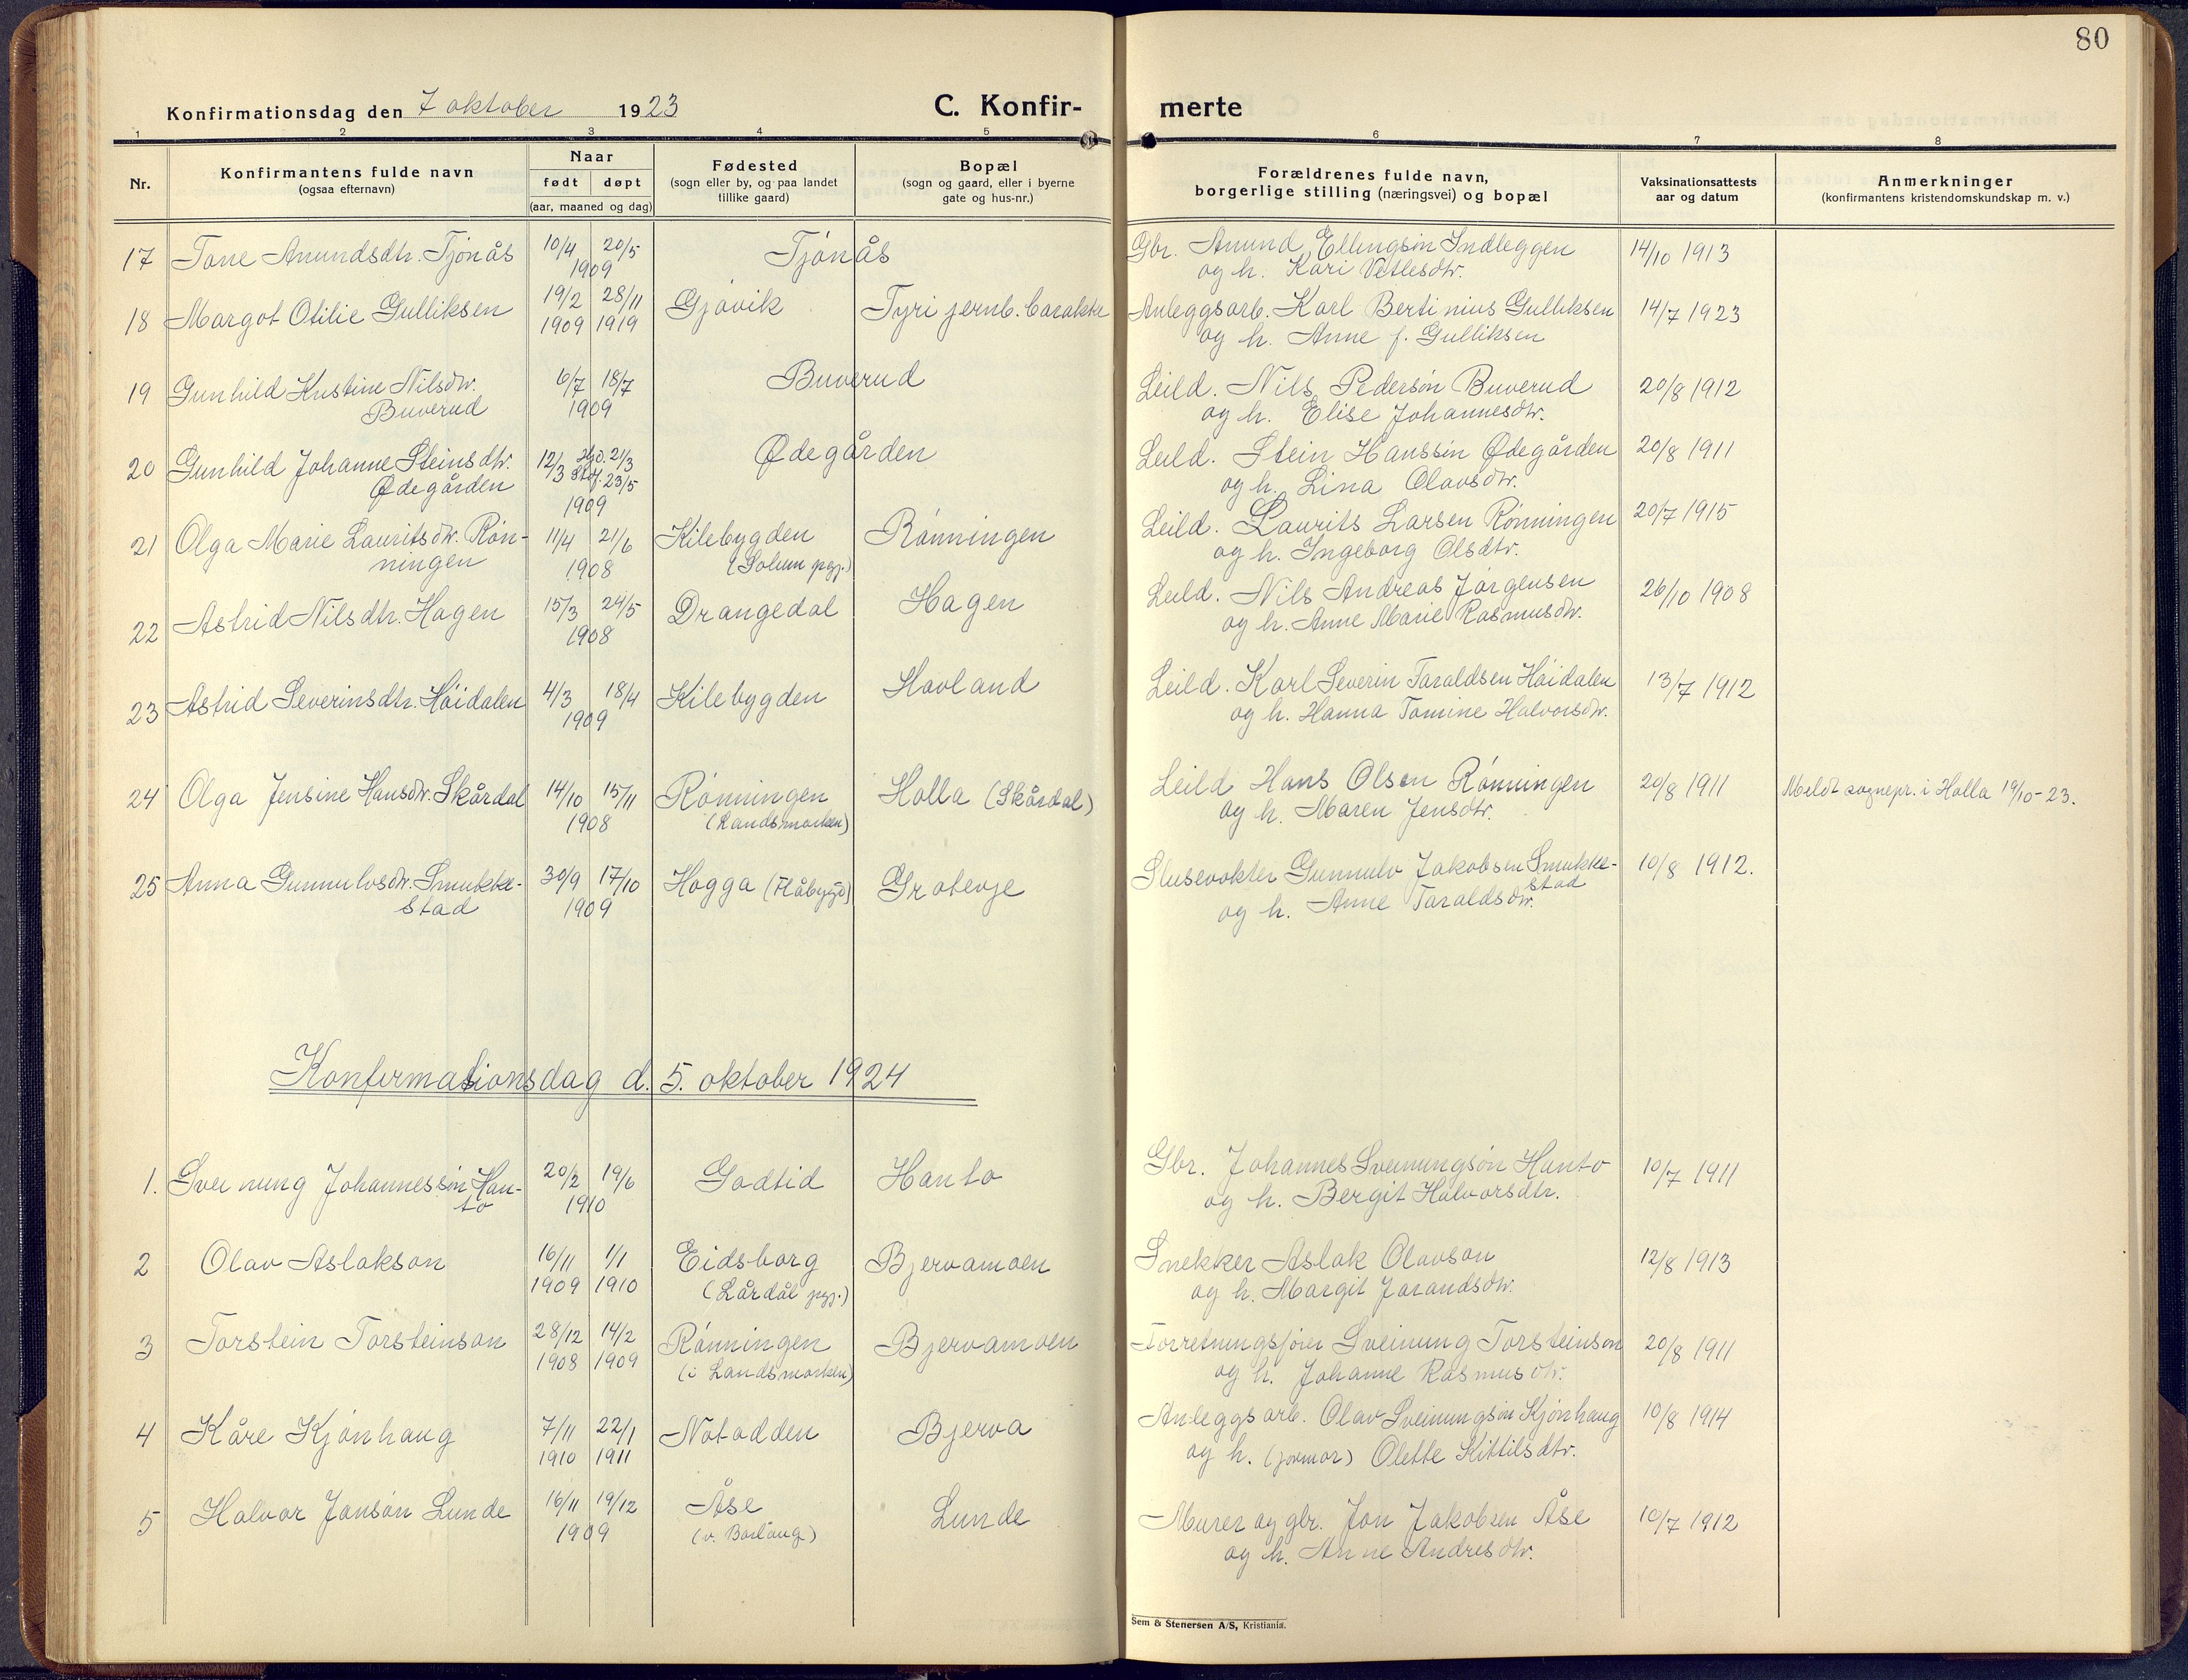 SAKO, Lunde kirkebøker, F/Fa/L0006: Ministerialbok nr. I 6, 1922-1940, s. 80